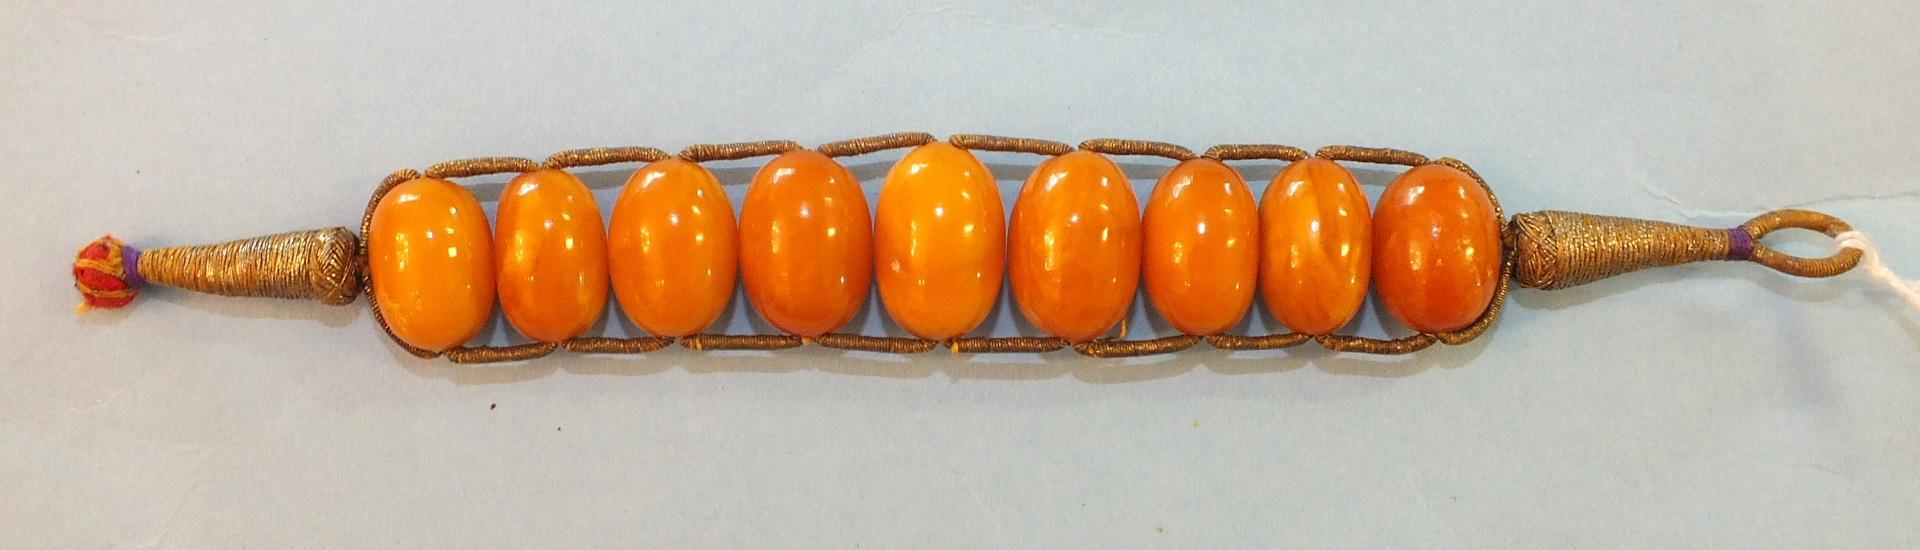 Lot 180 - An ethnic amber bracelet of nine graduated amber beads on metallic thread mount, 17cm, 16.7g.